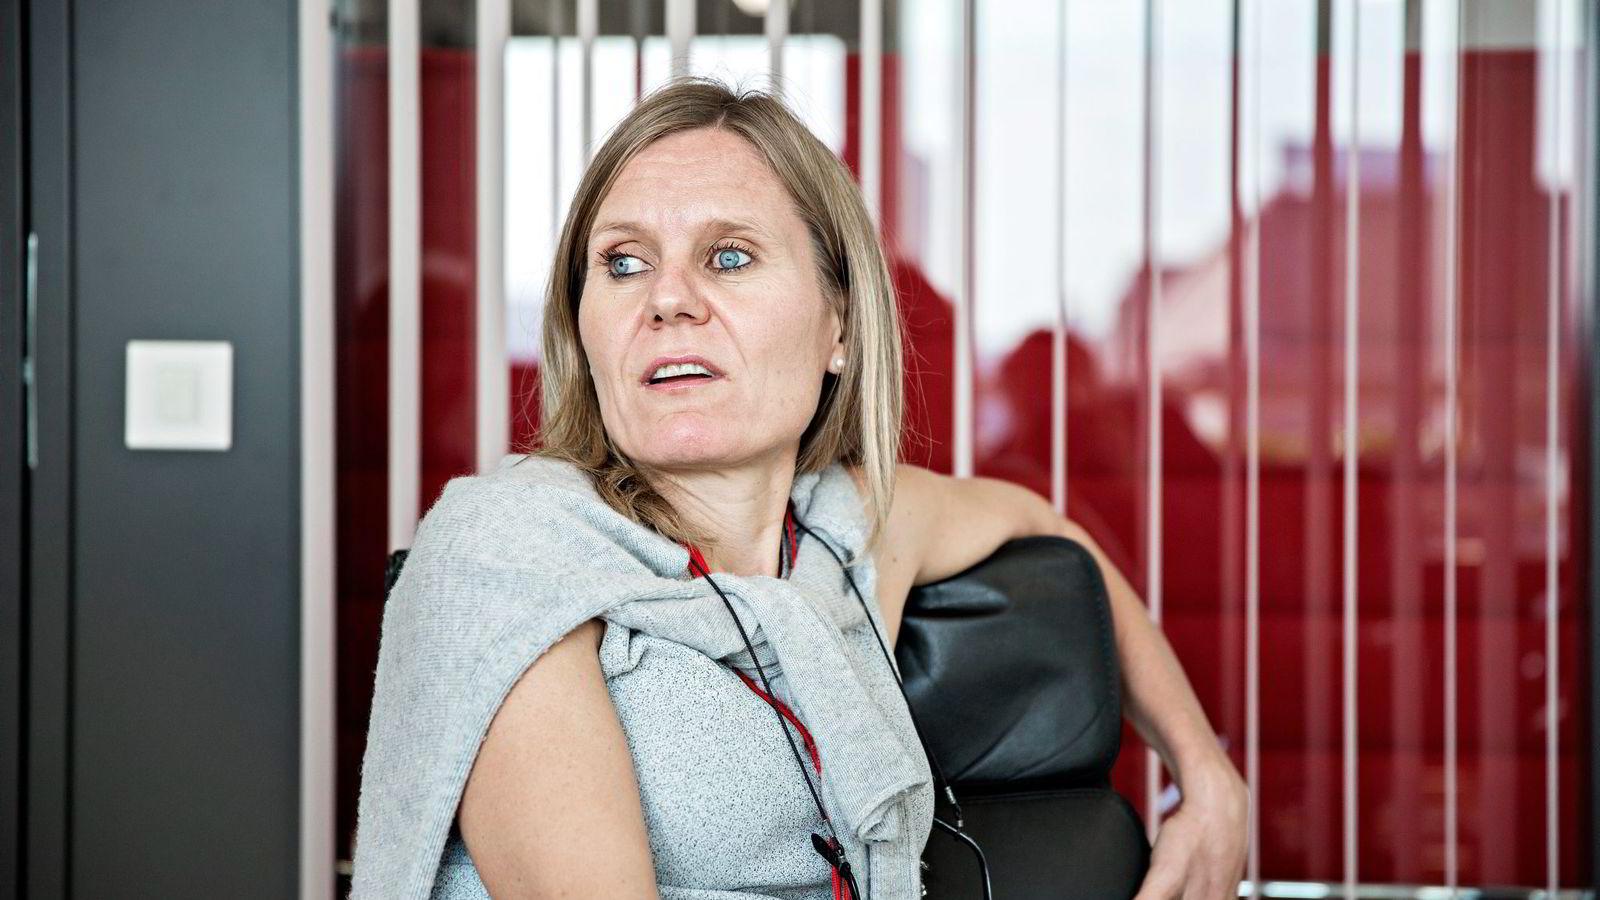 Sjef i VGTV, Helje Solberg, forteller at «Level Up» har mistet mange seere. Foto: Aleksander Nordahl